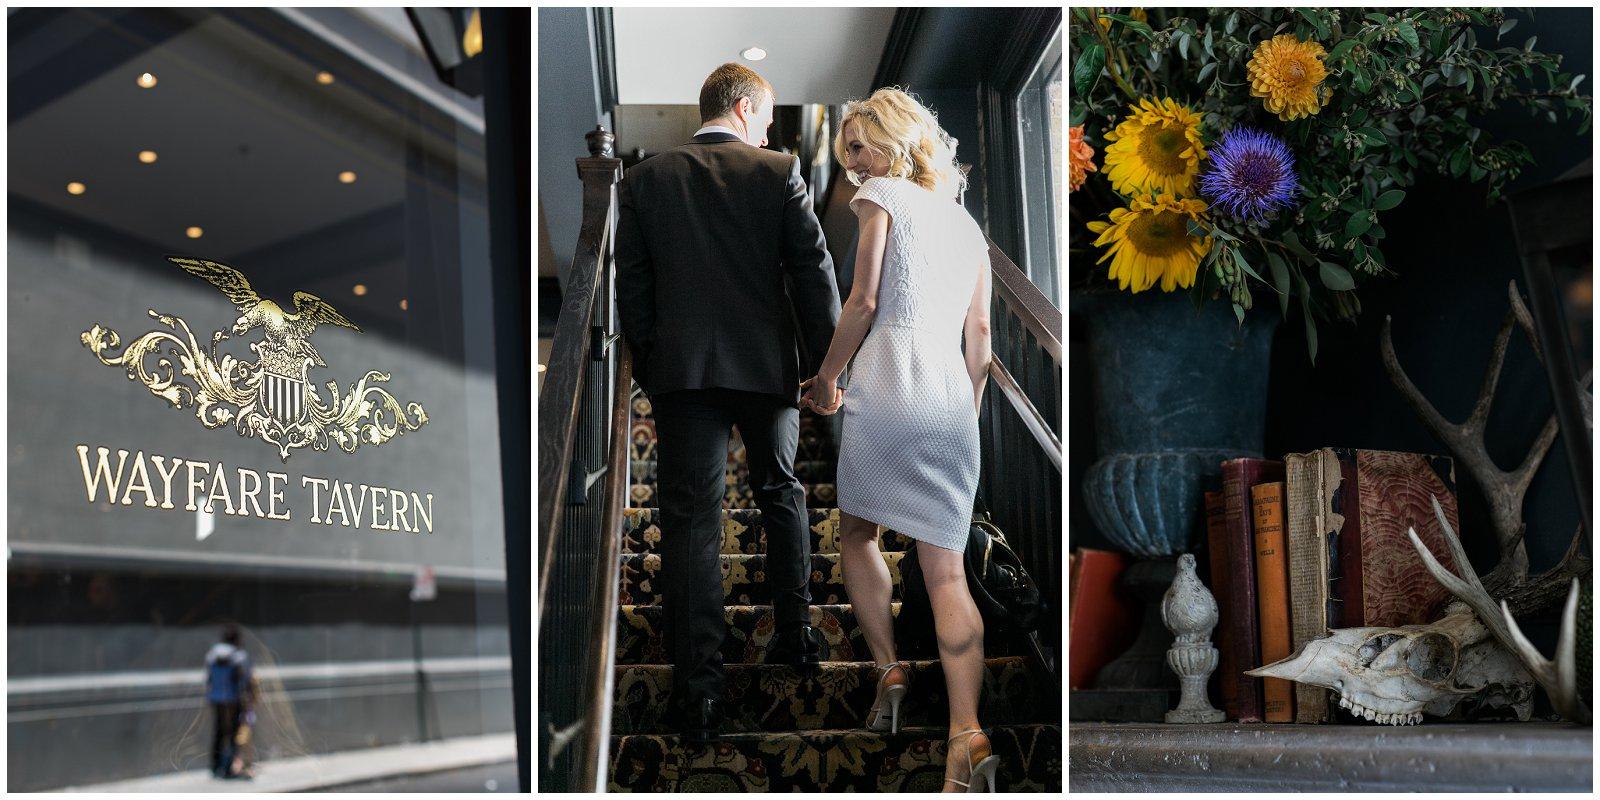 San-Francisco-Bay-Area-Wedding-Photography-City-Hall-12.jpg